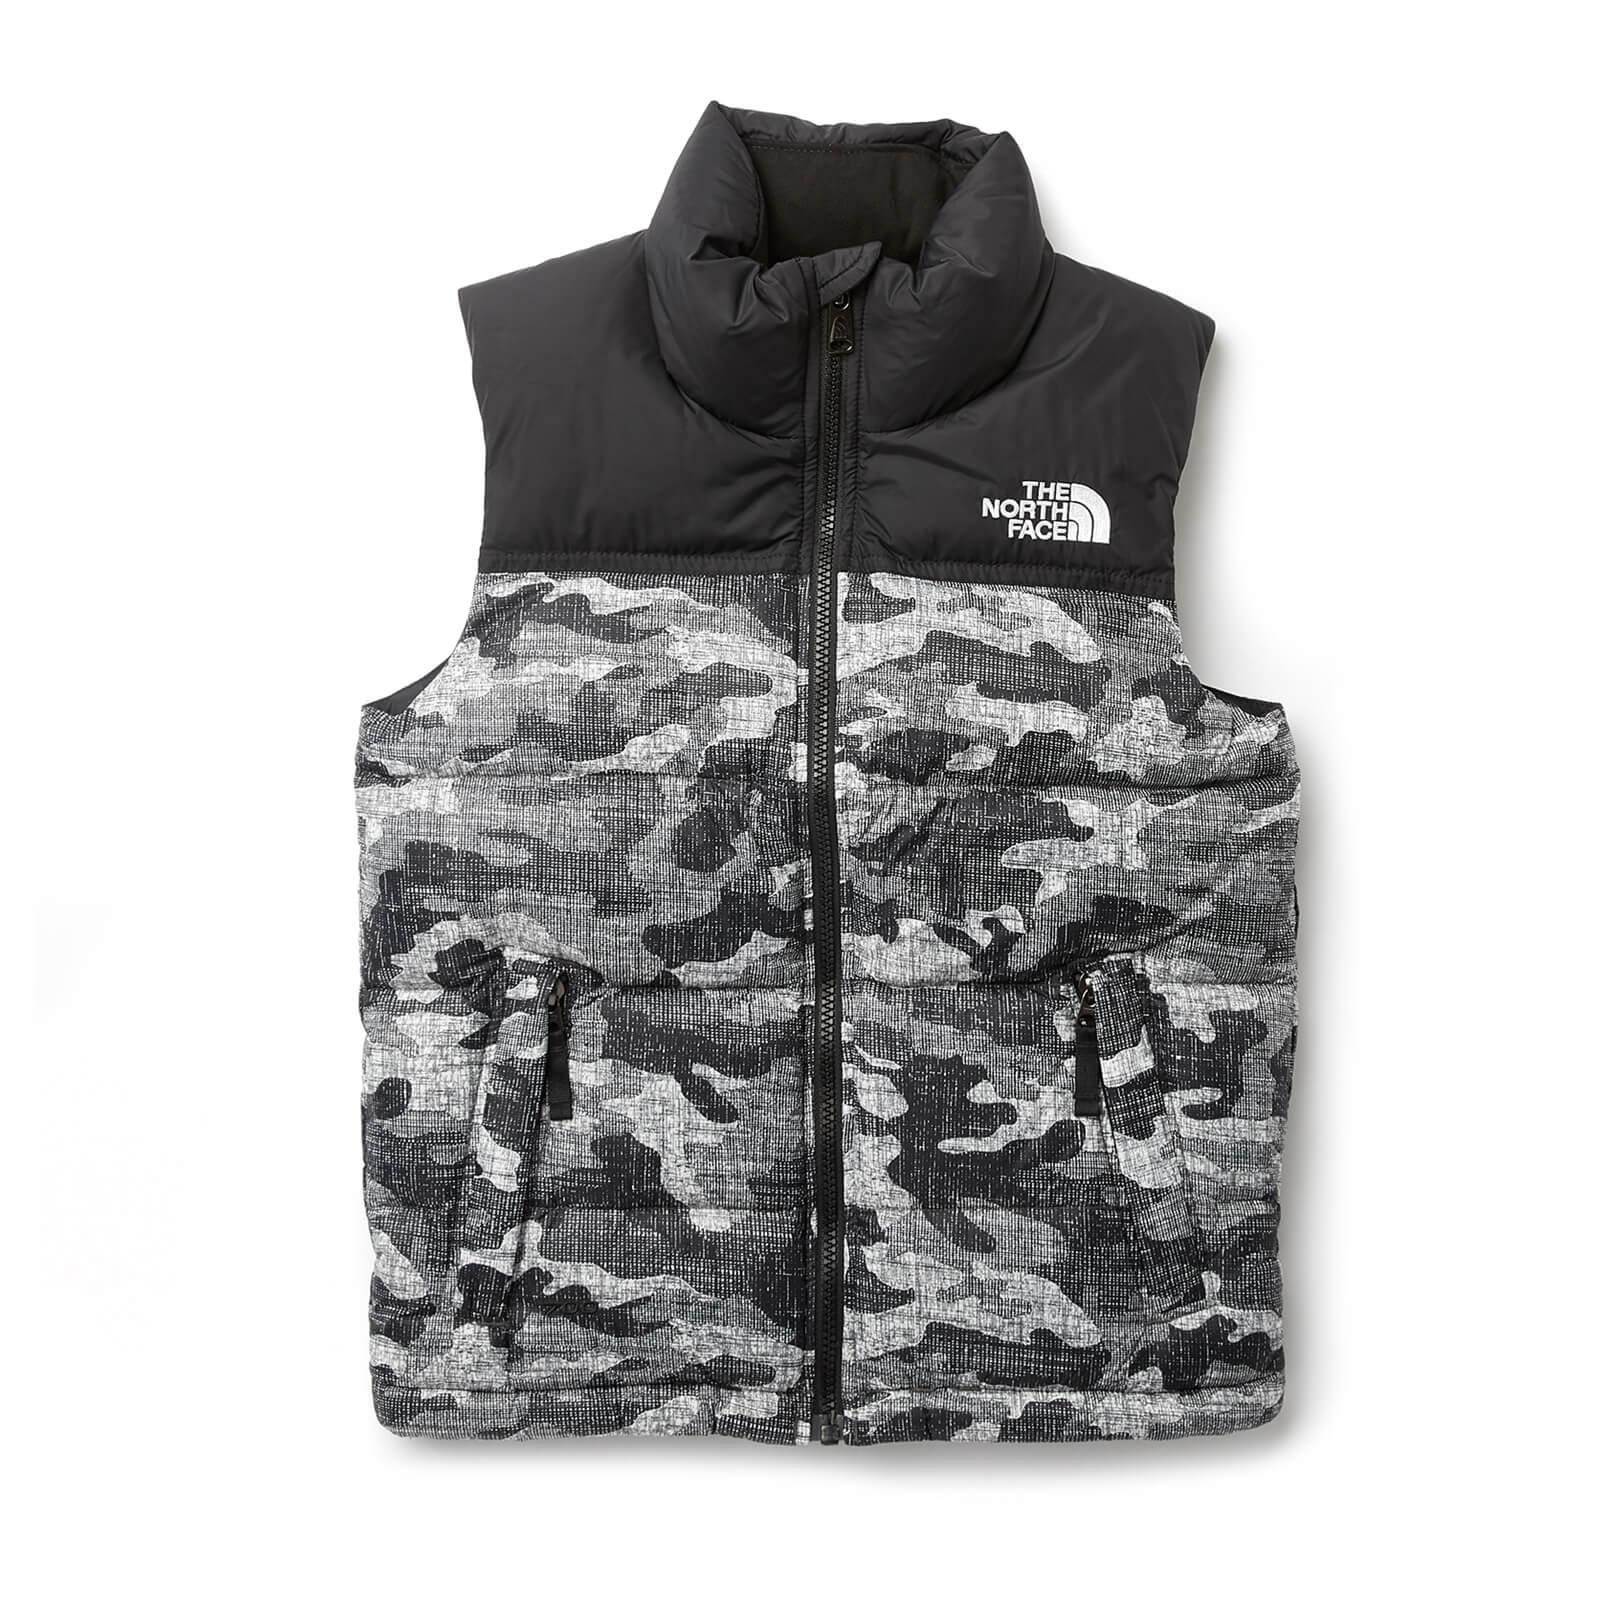 92a5b77f2f27e The North Face Boys' Nuptse Down Vest - TNF Black Textured Camo Print  Clothing | TheHut.com